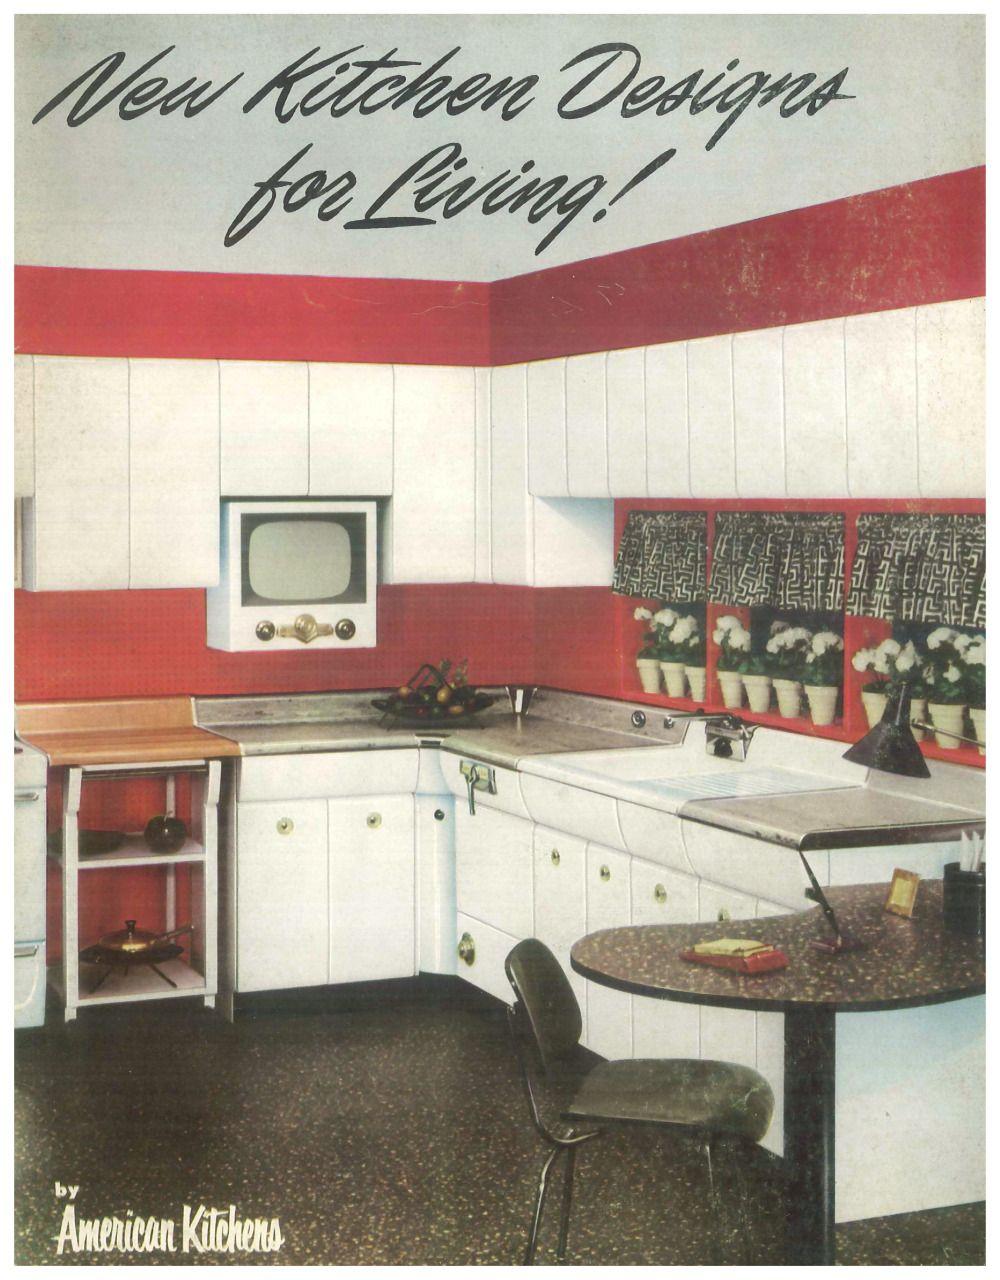 Pin By Larissa Lemke On 1950 S Americana New Kitchen Designs American Kitchen Retro Appliances